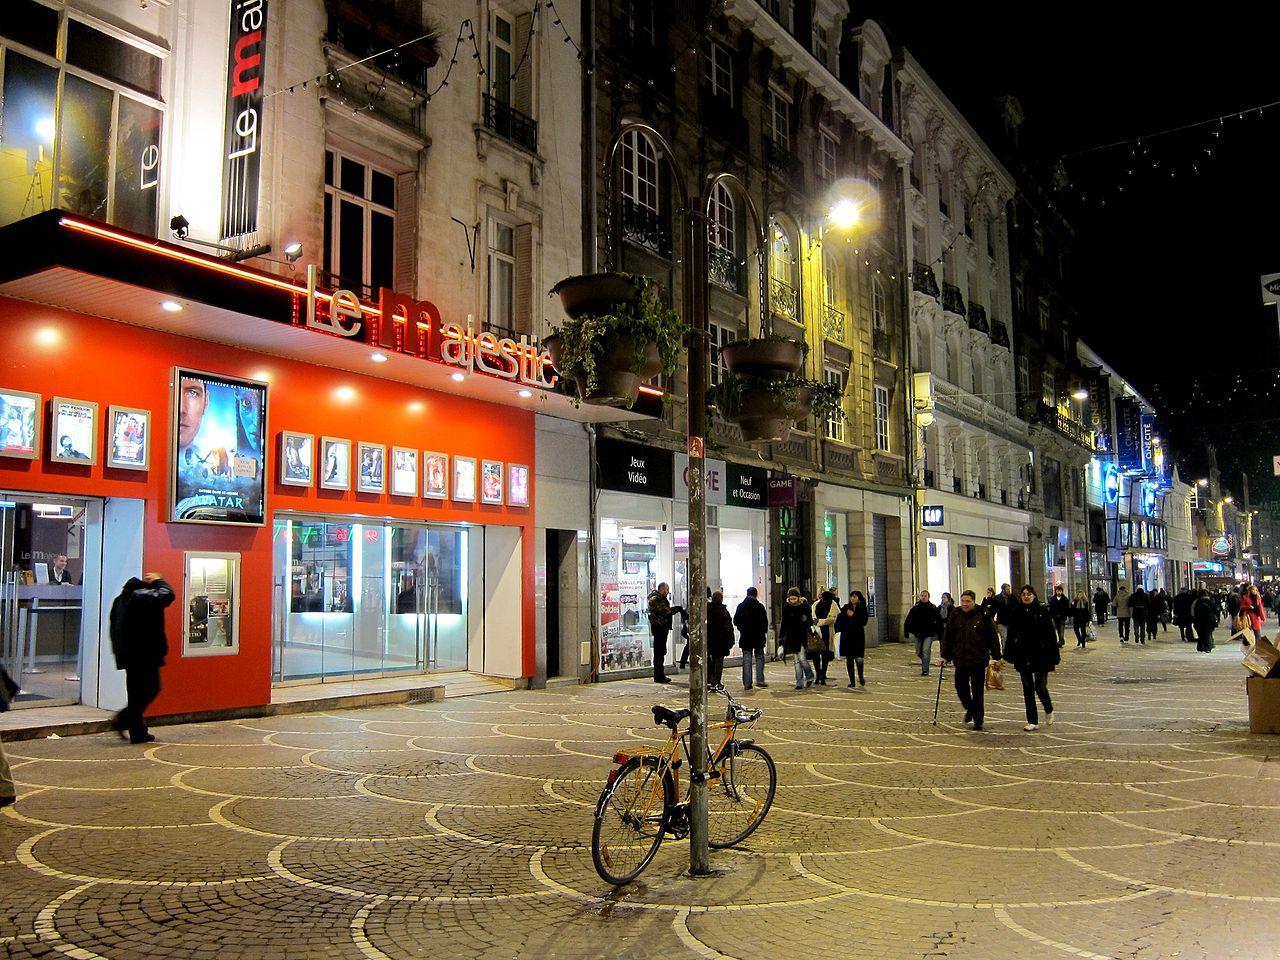 File:Lille rue de béthune.JPG - Wikimedia Commons